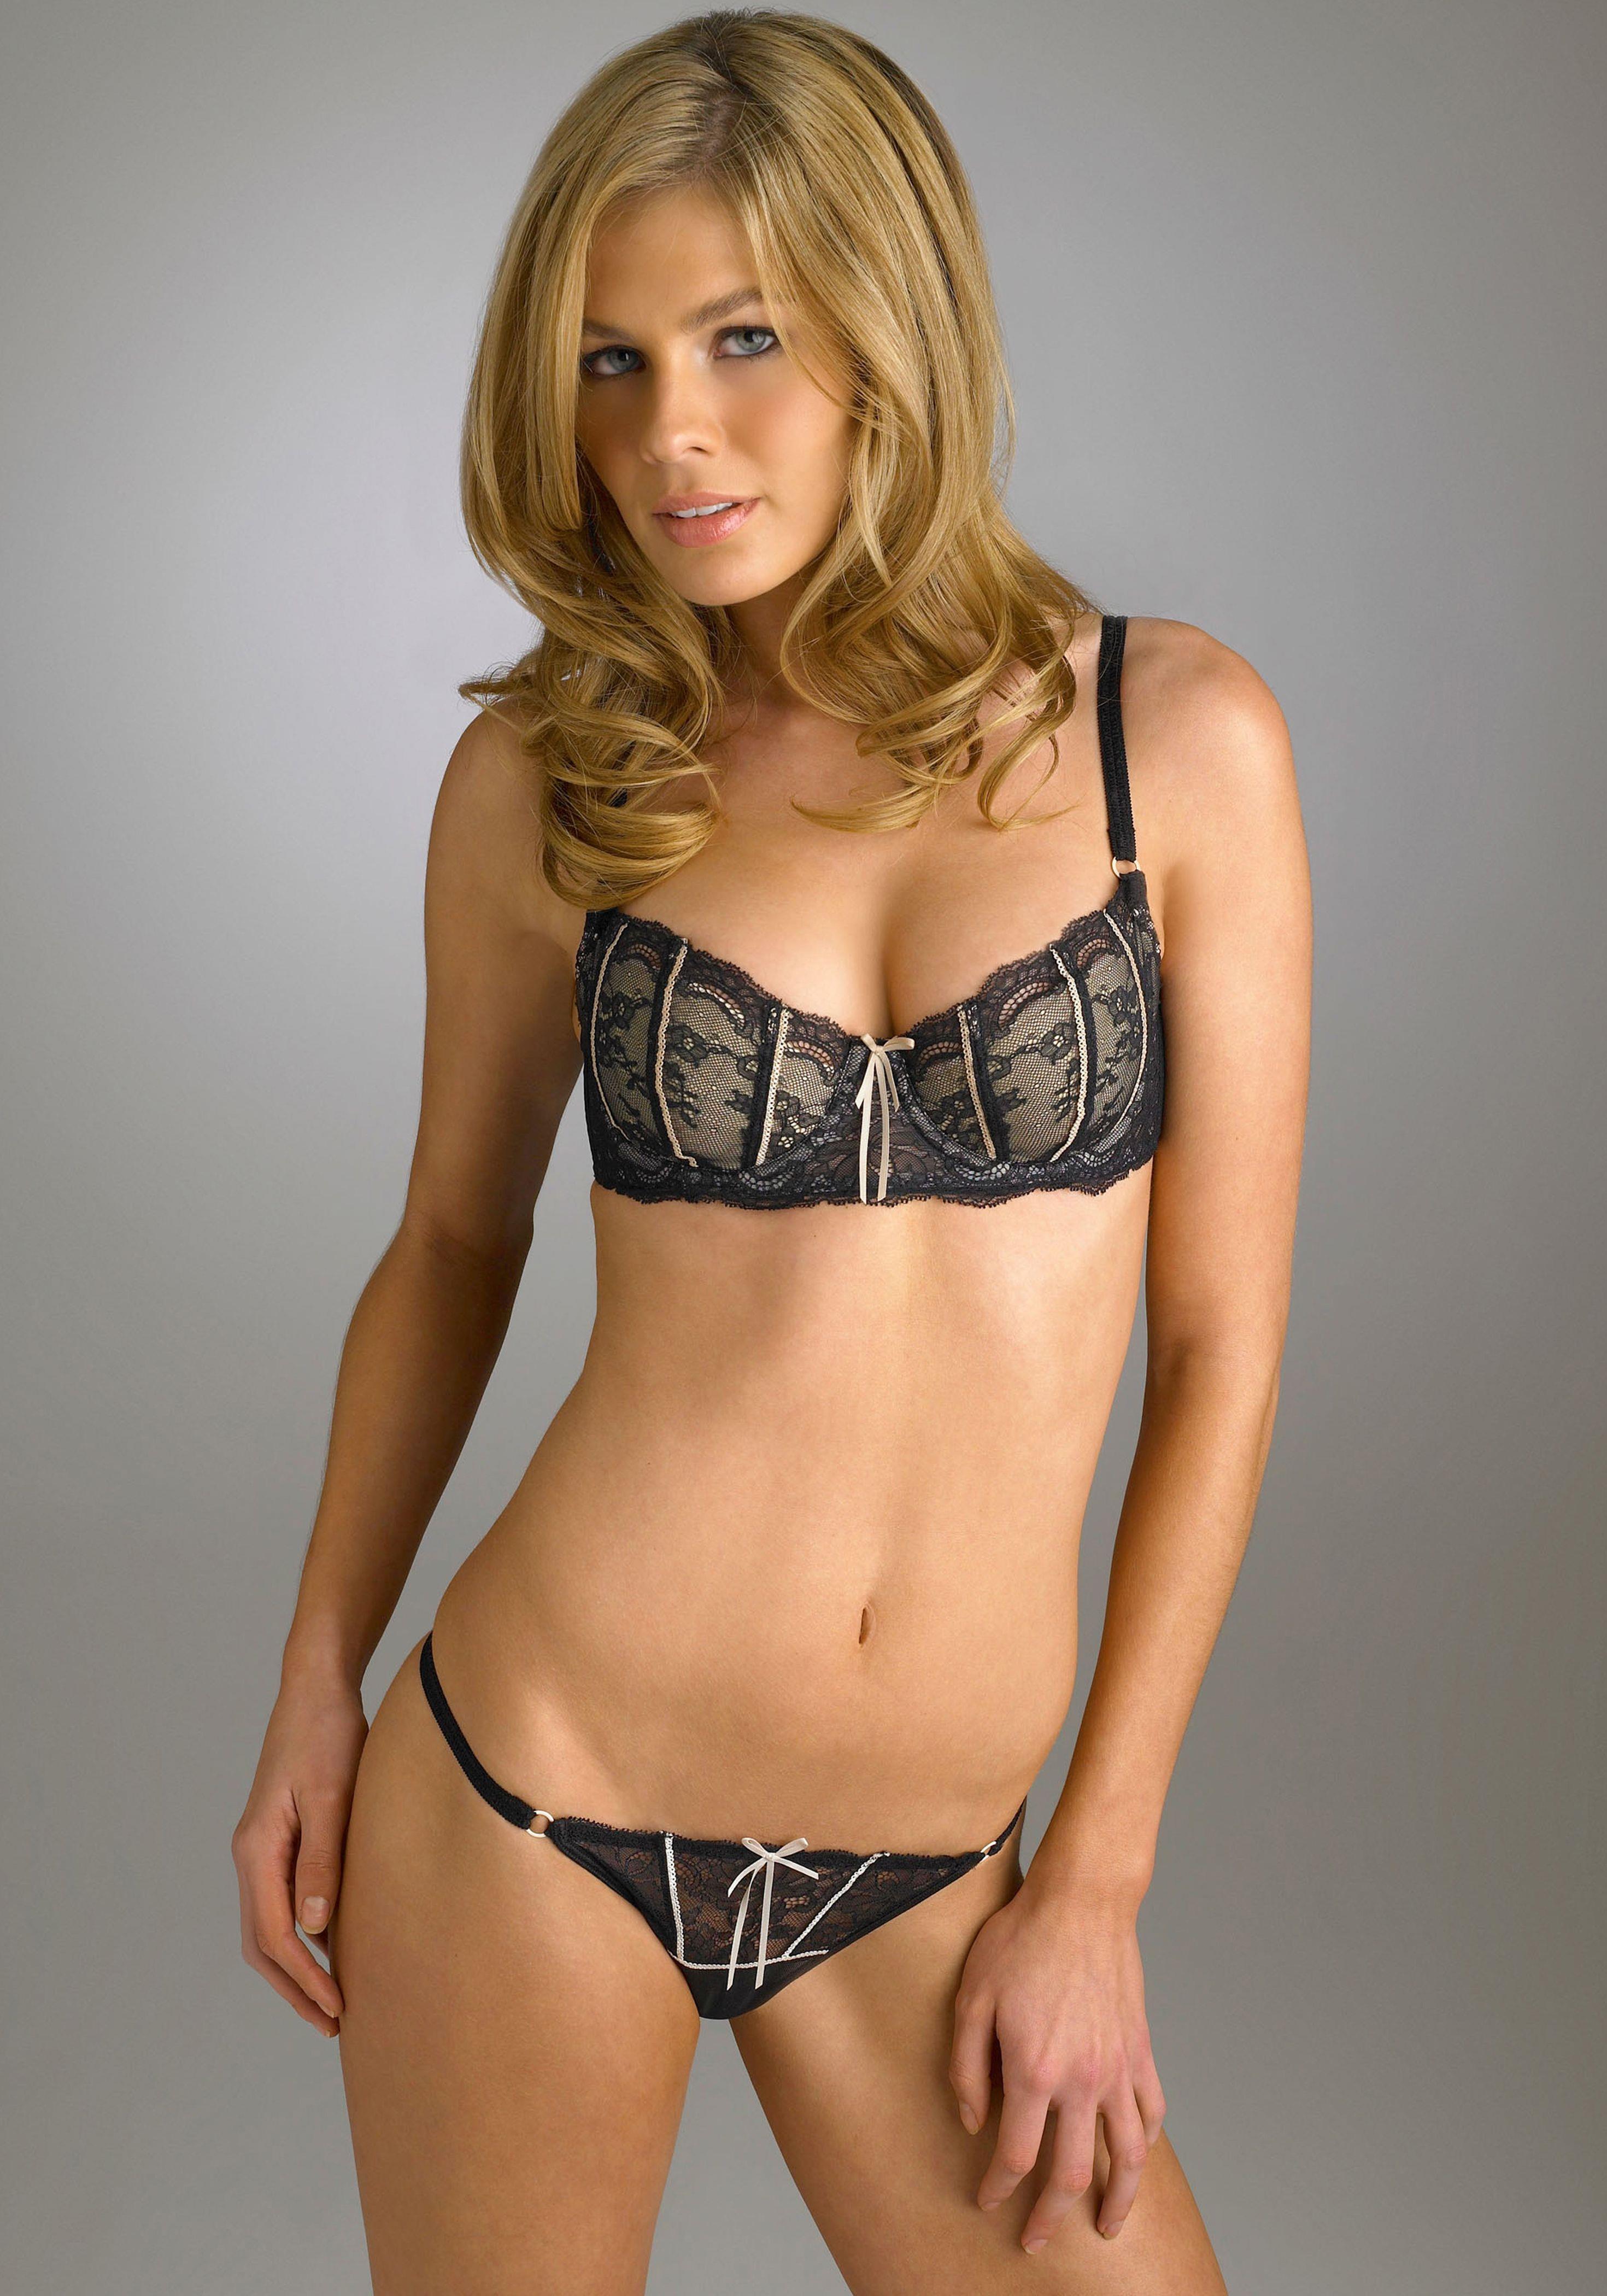 Caitlin Manley in lingerie